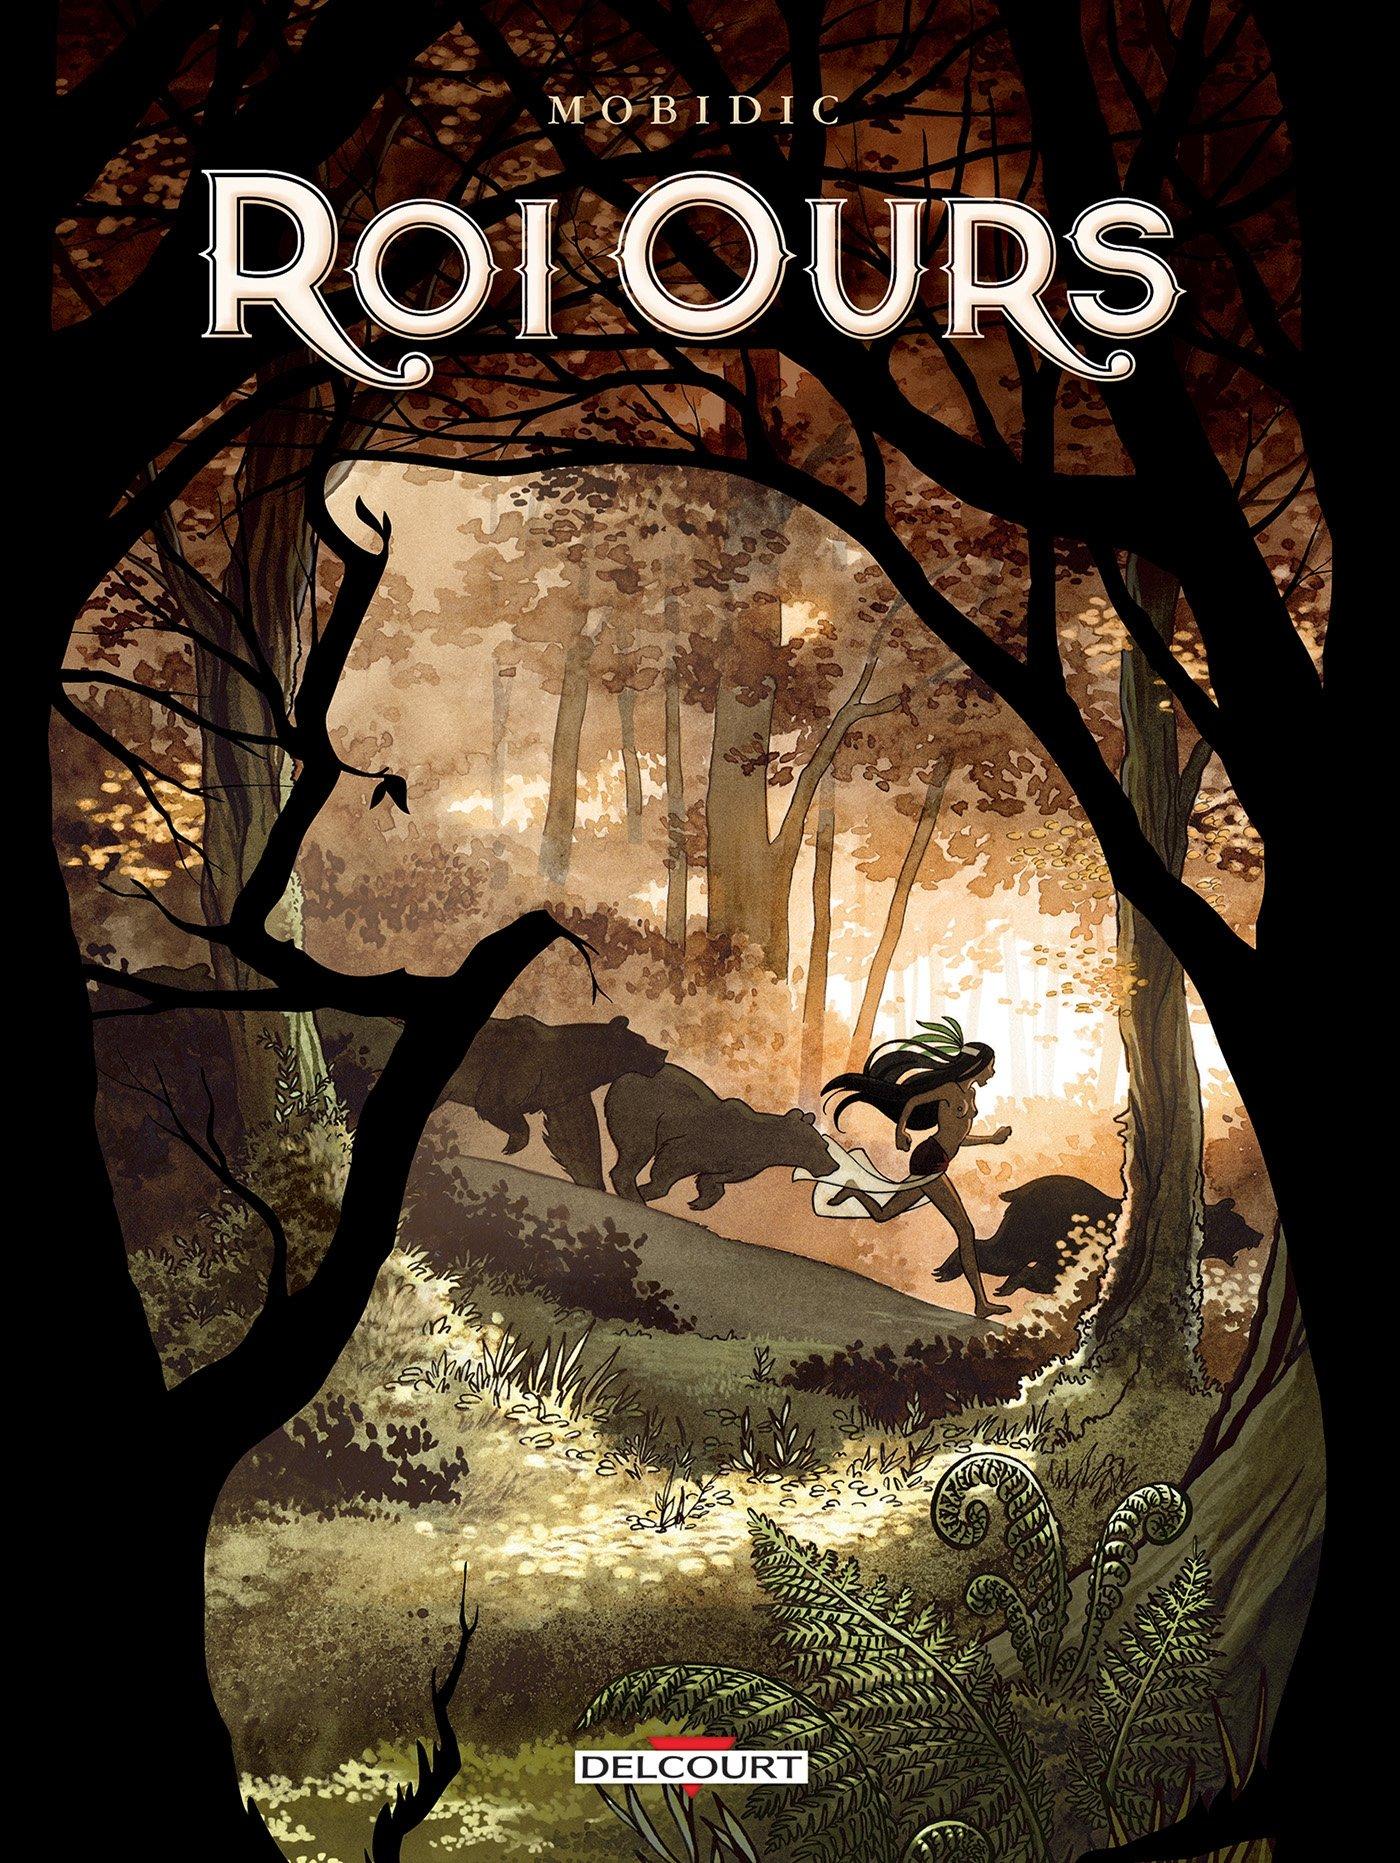 Amazon.fr - Roi Ours - Mobidic, Mobidic - Livres